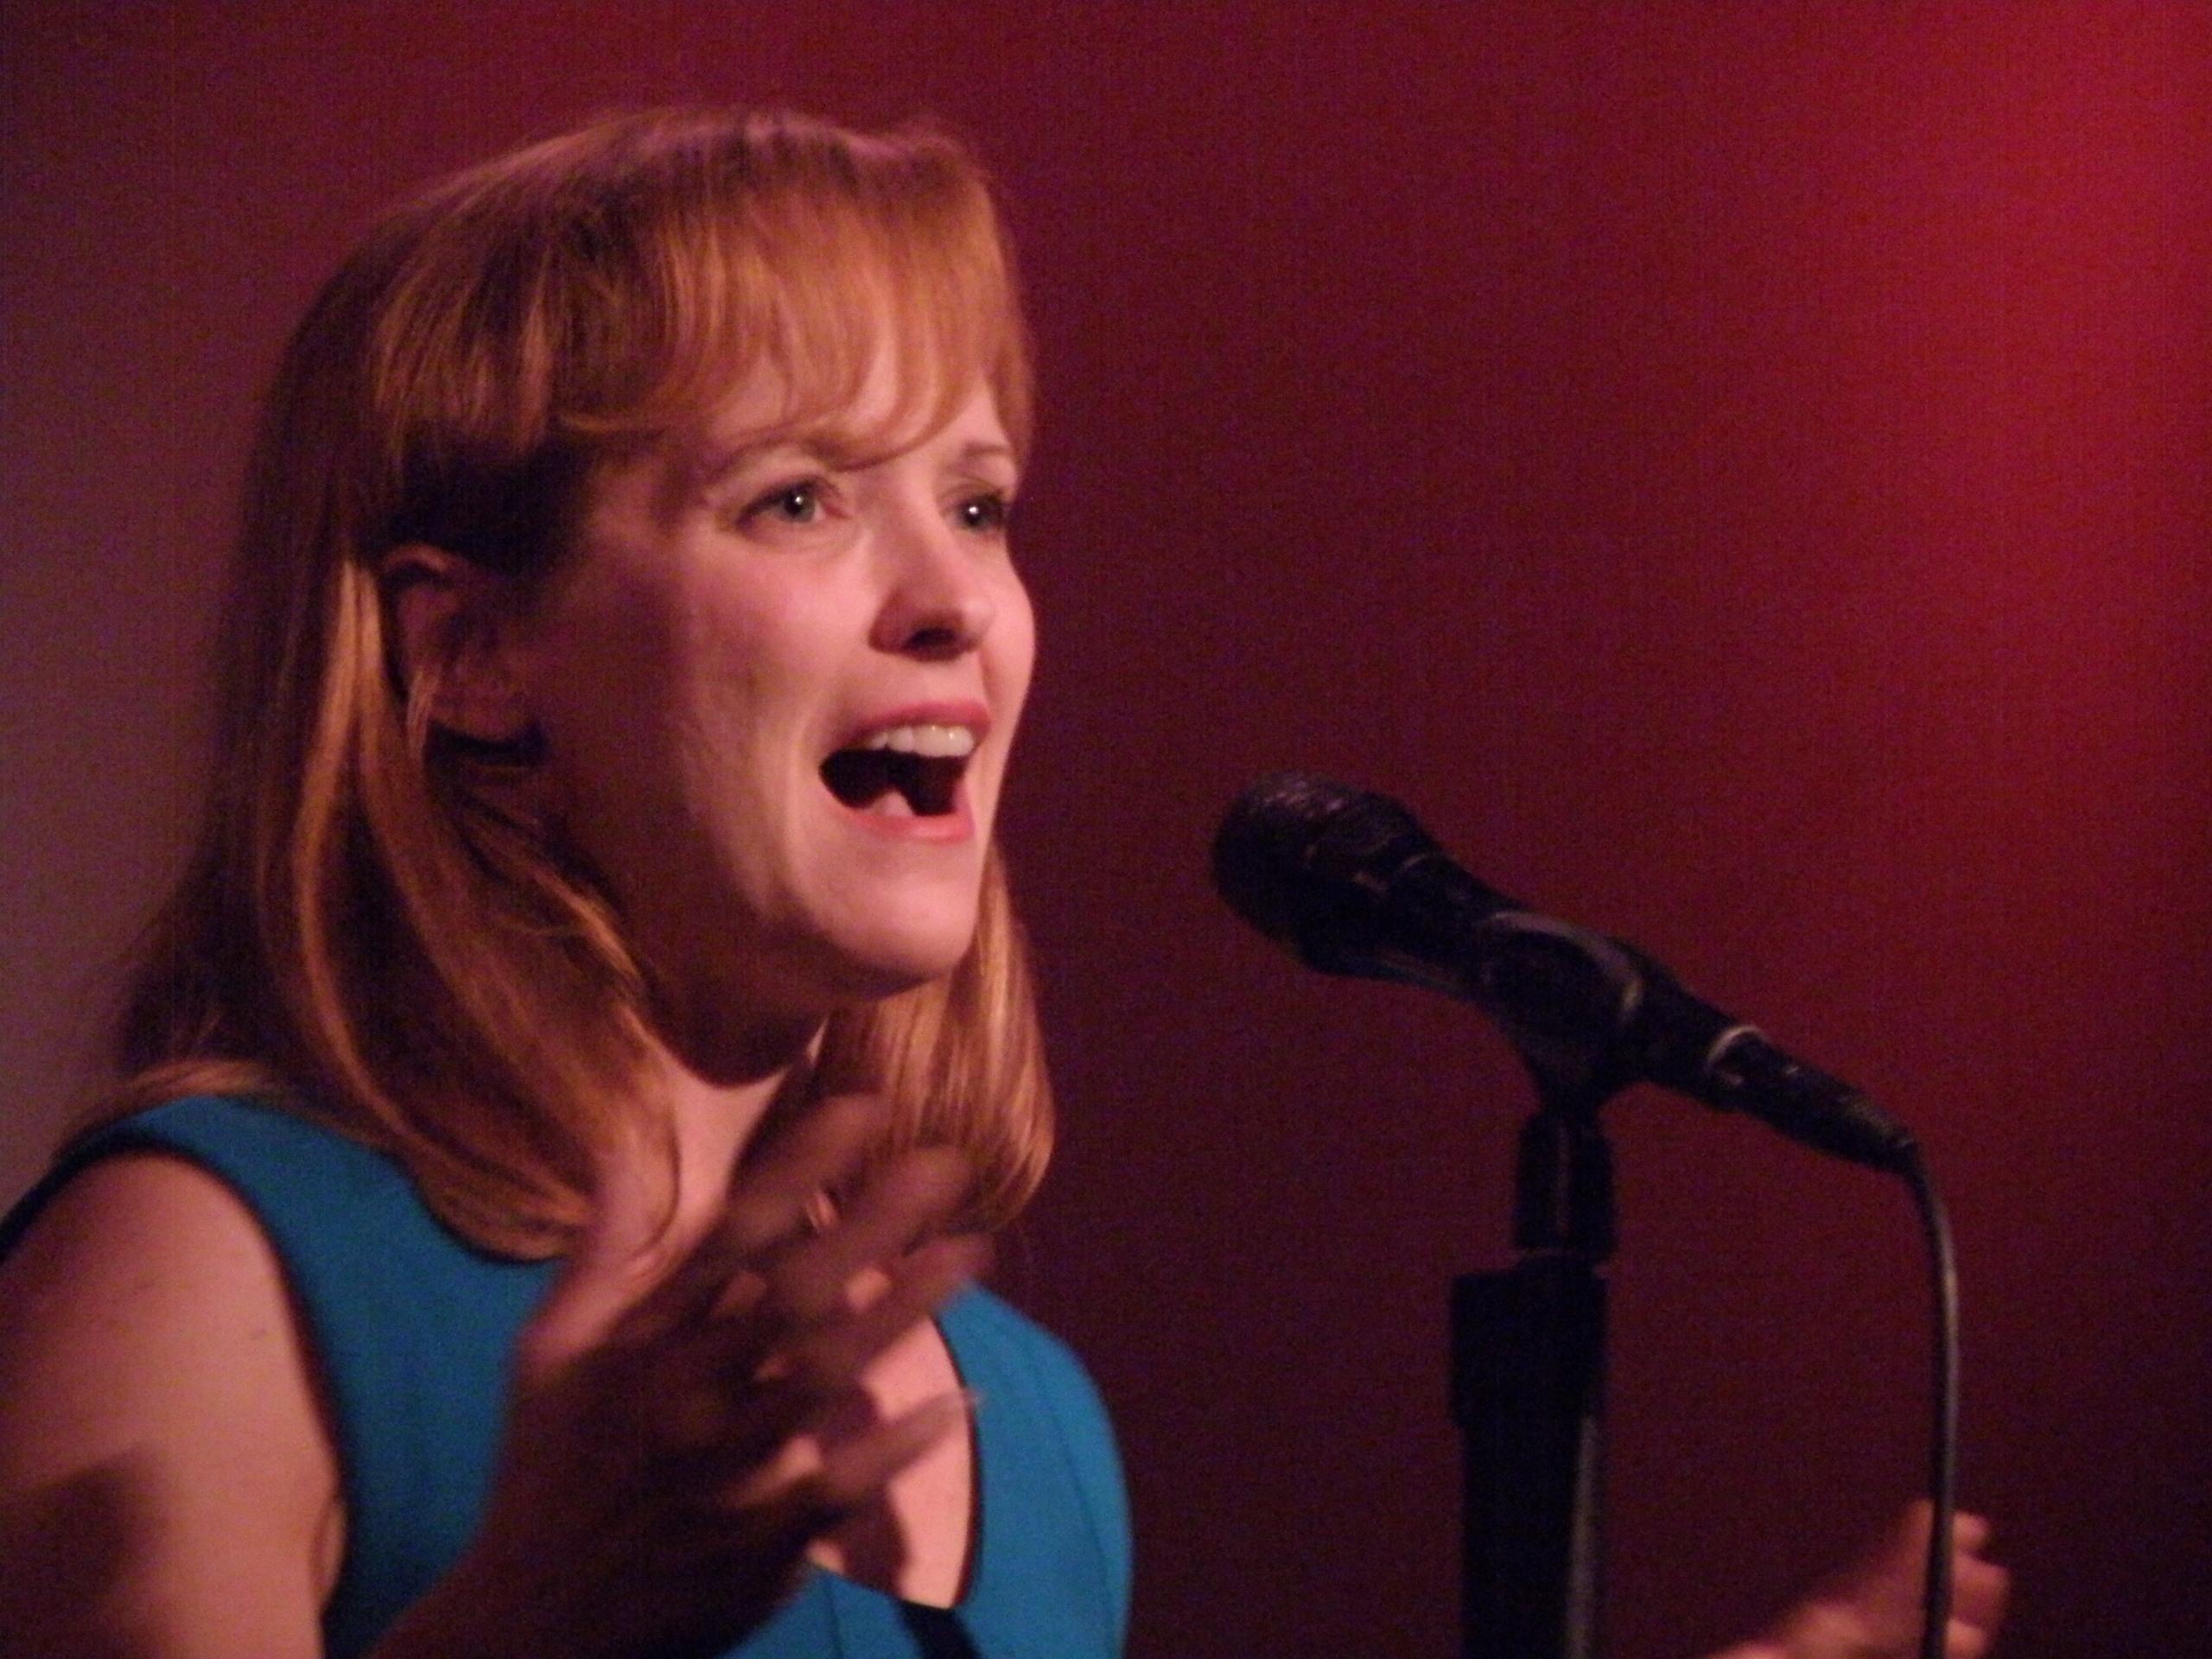 Lauren Stanford Wins MetroStar Talent Challenge at Metropolitan Room (see video)